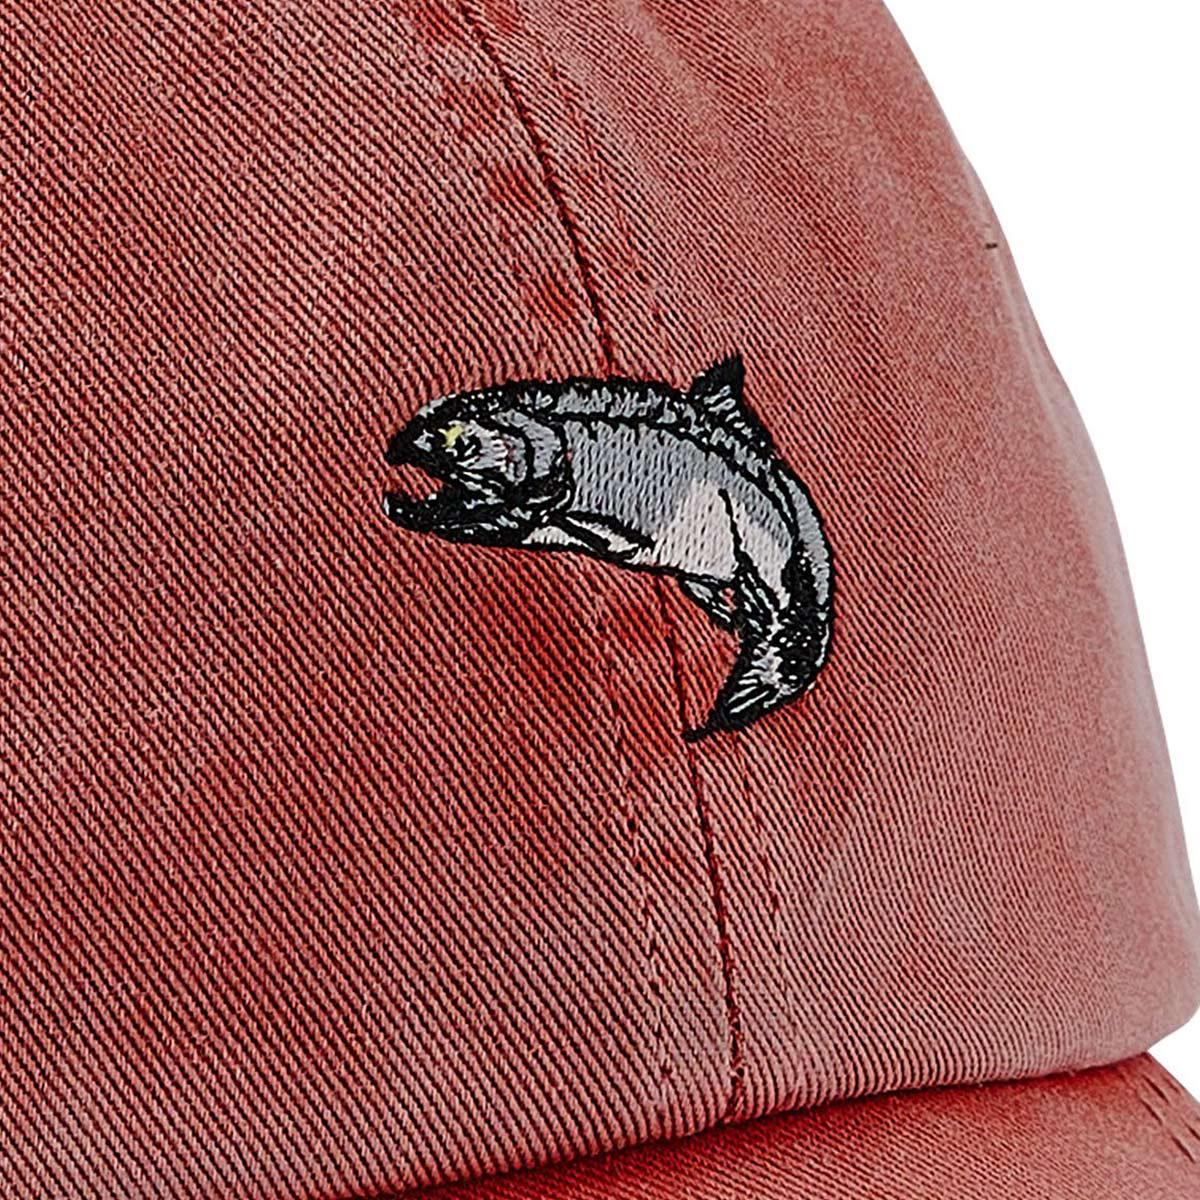 Filson Washed Low Profile Cap 20204530-Faded Red Salmon, klassieke low-profile pet die beschermt tegen de elementen